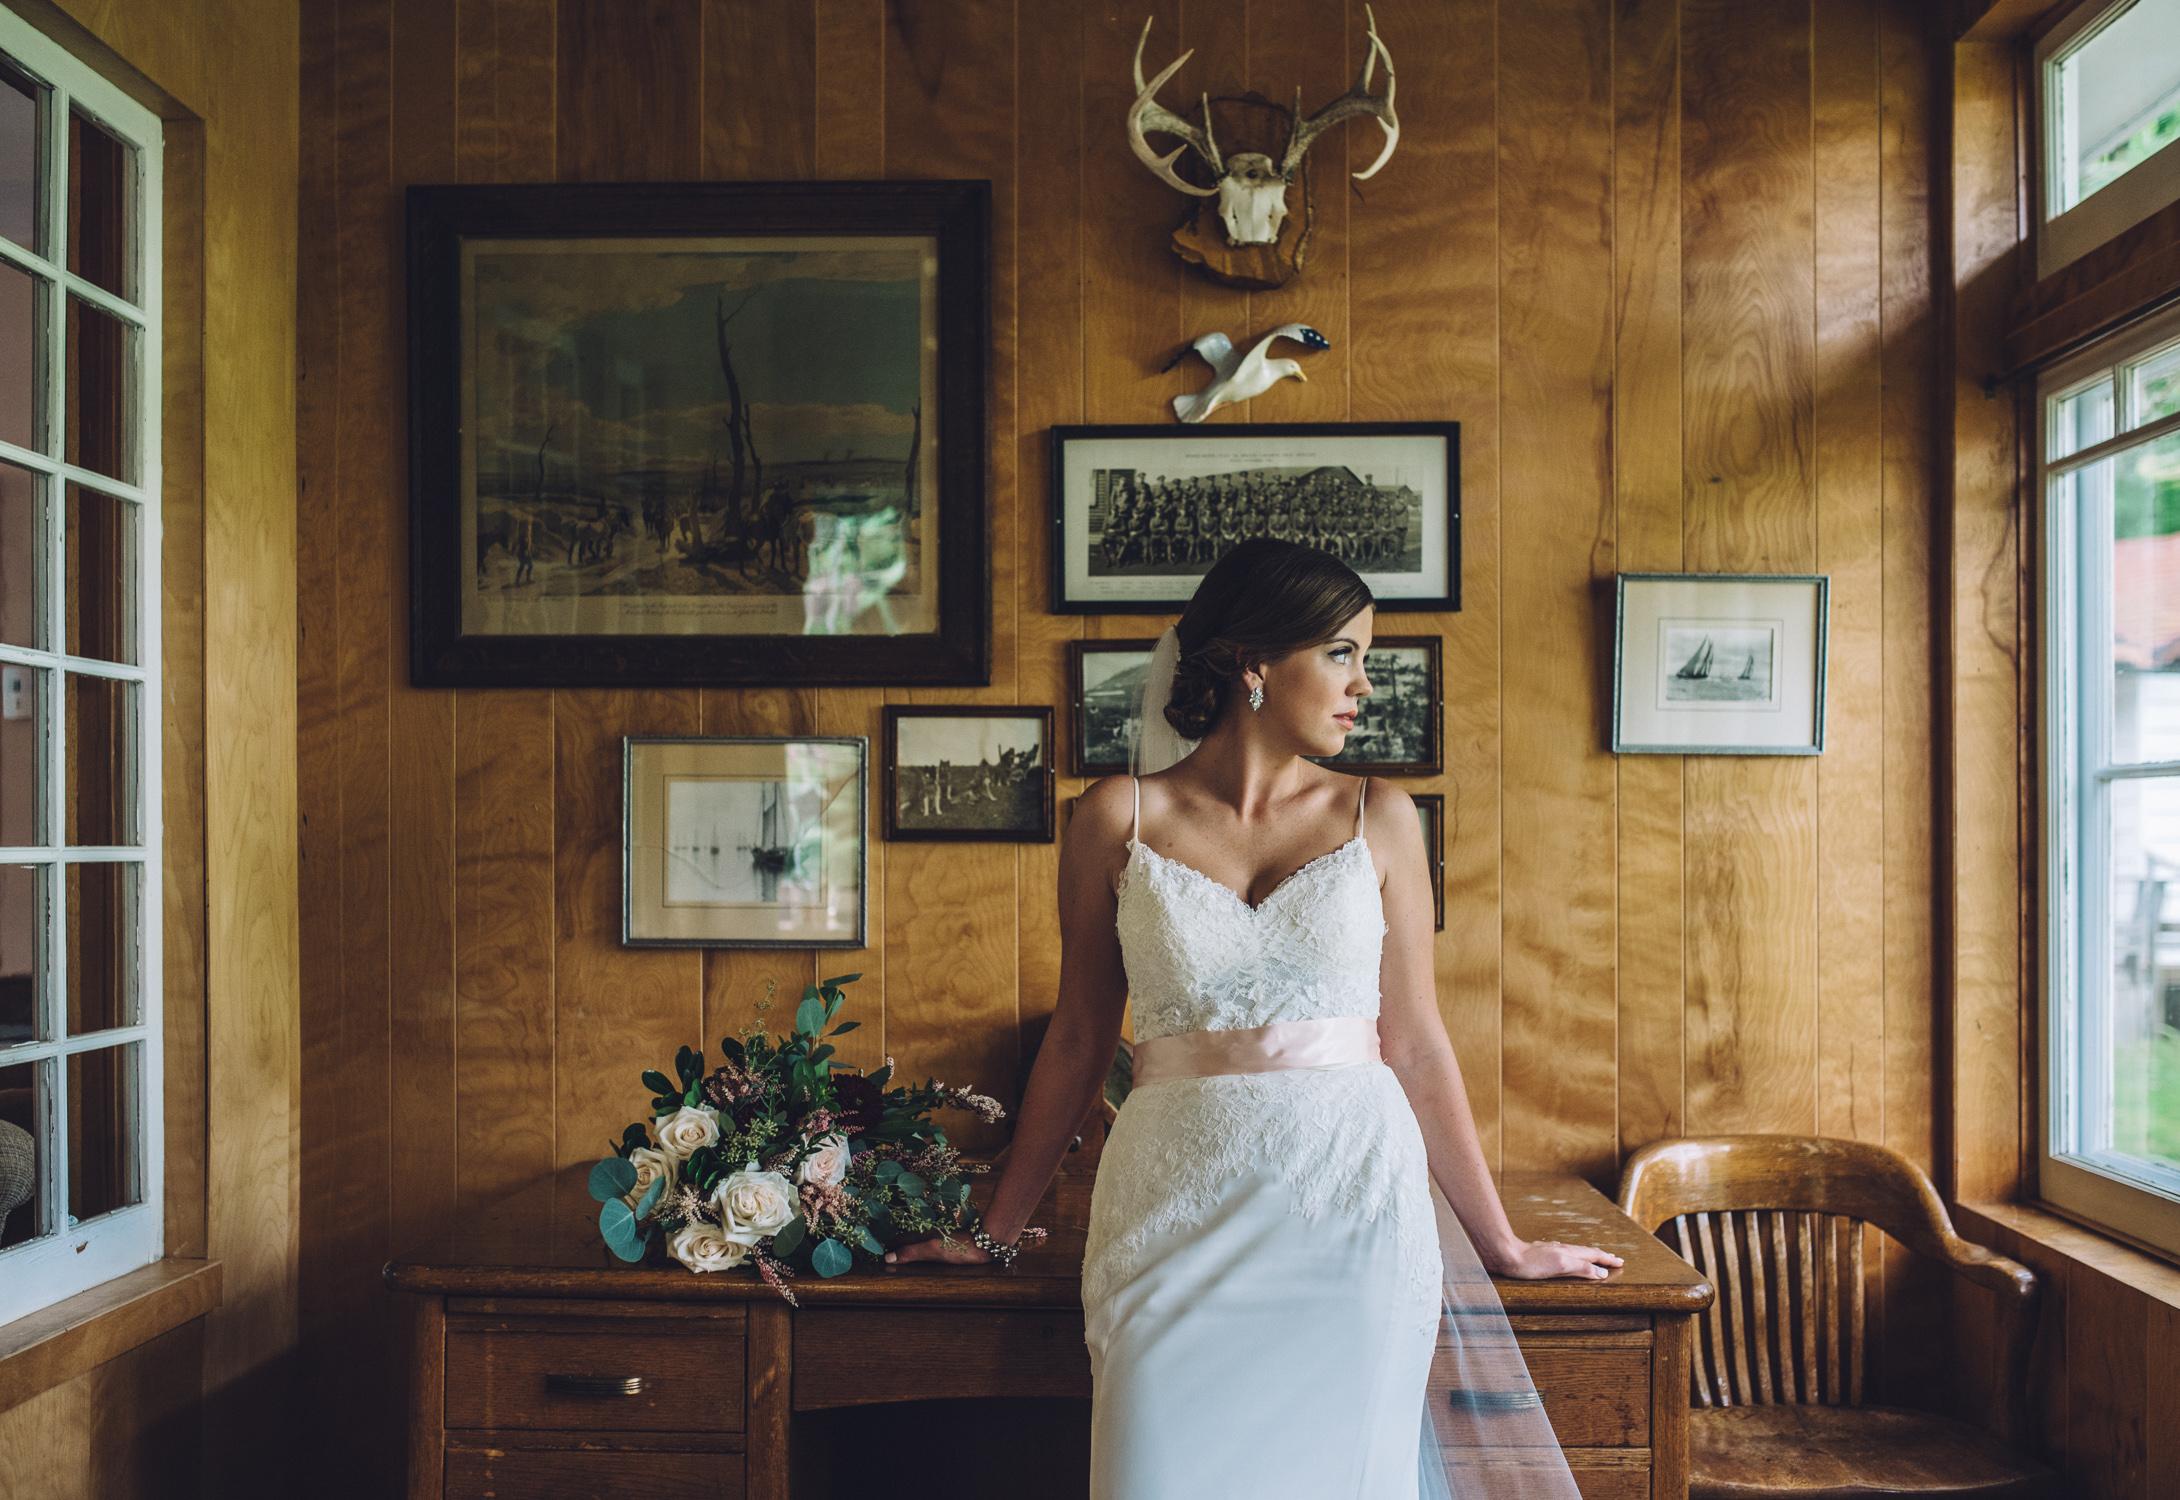 Emma waits for the wedding ceremony to begin at Lumina Resort in Muskoka